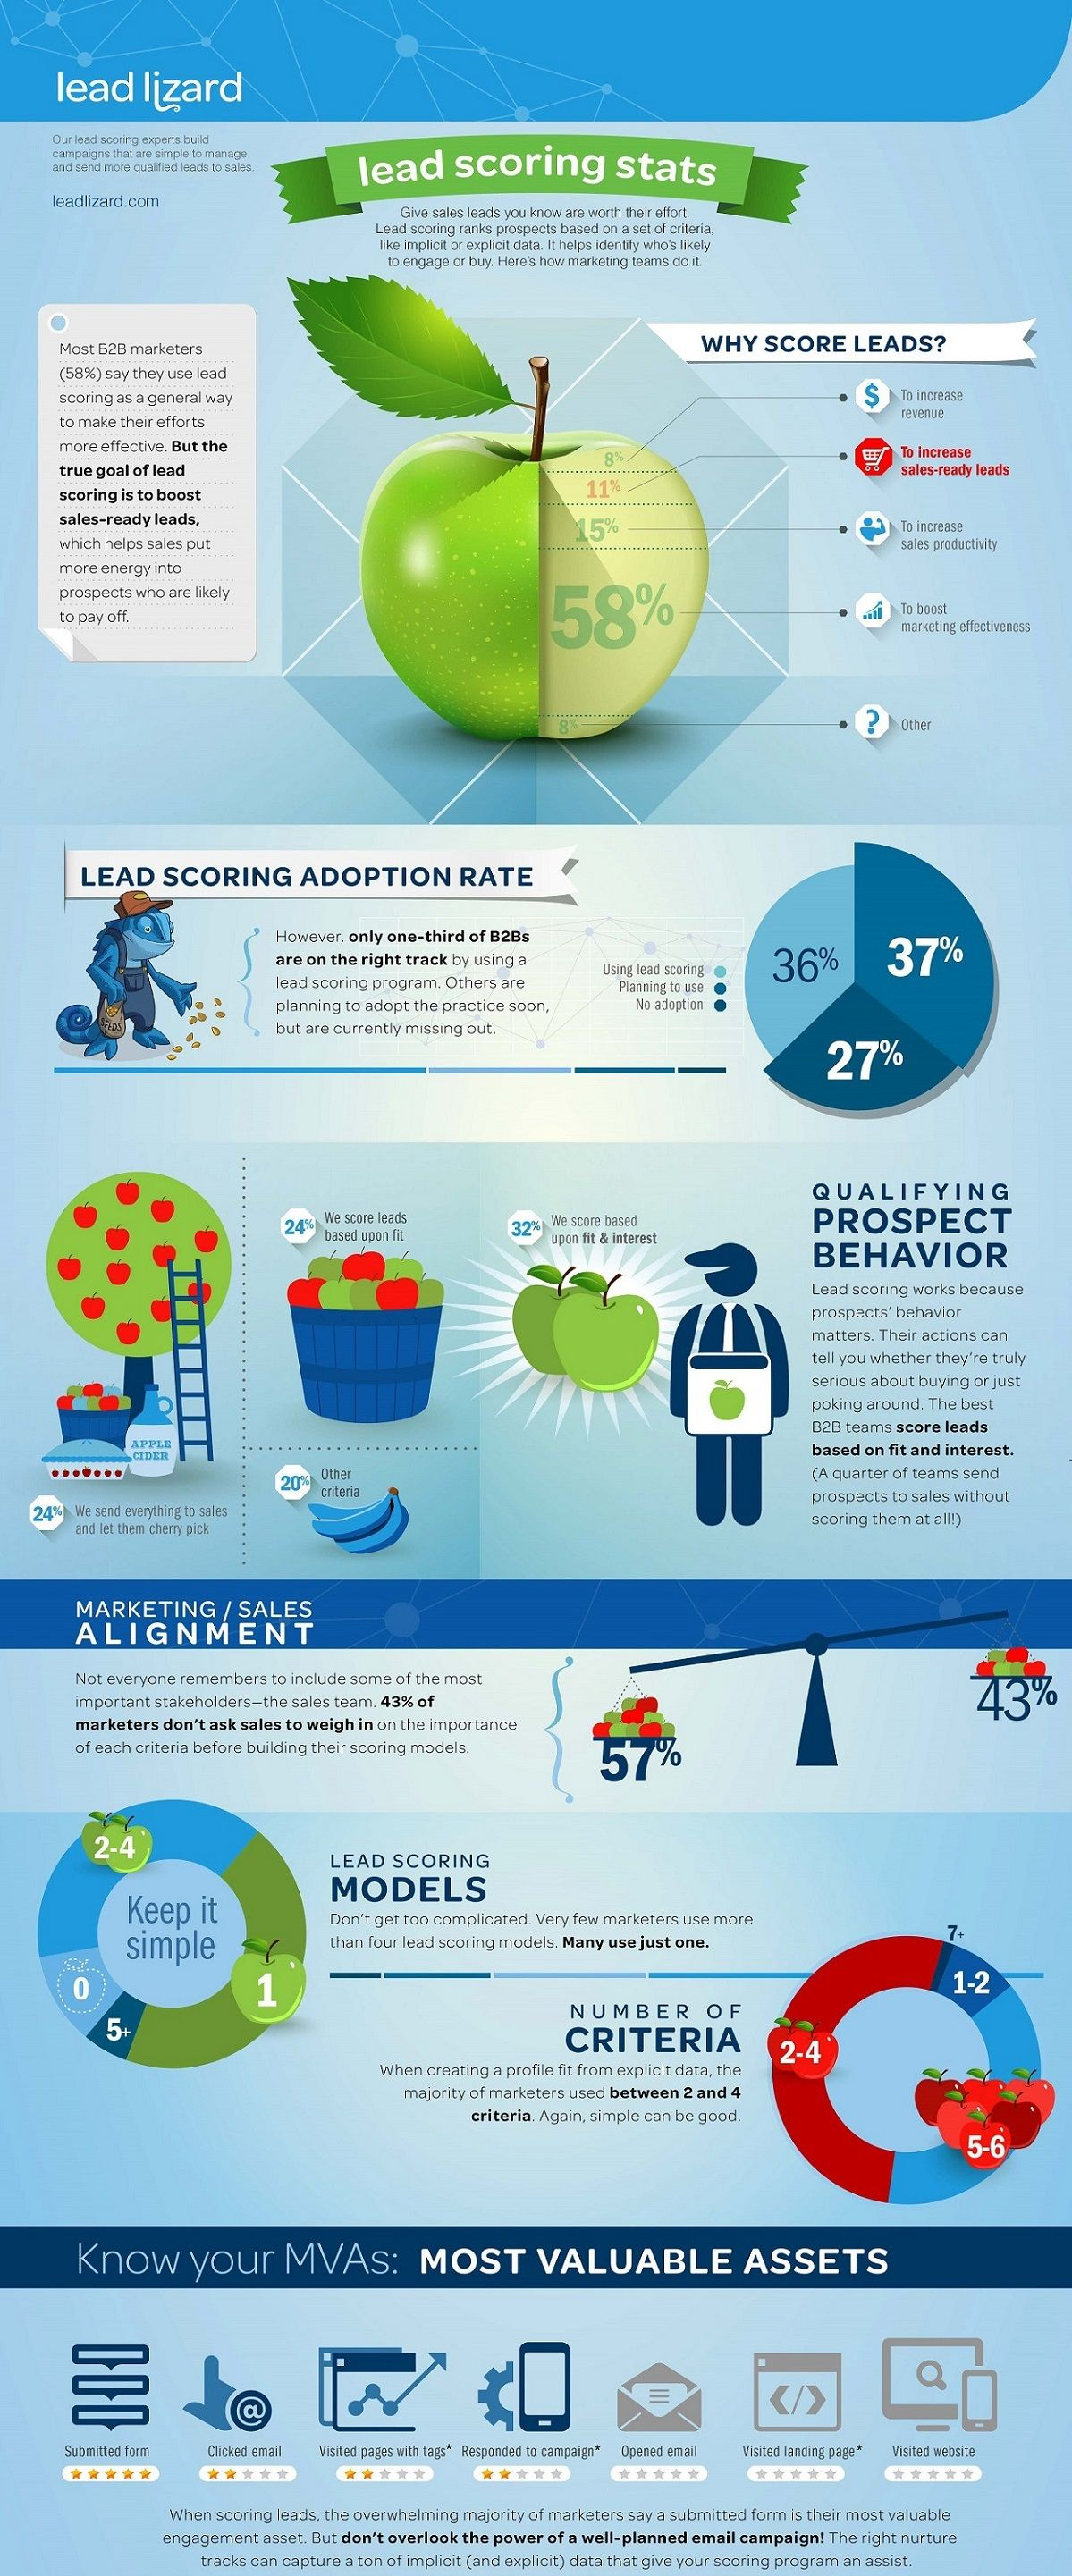 Infographic – Lead Scoring Adoption and Usage among B2B Marketers